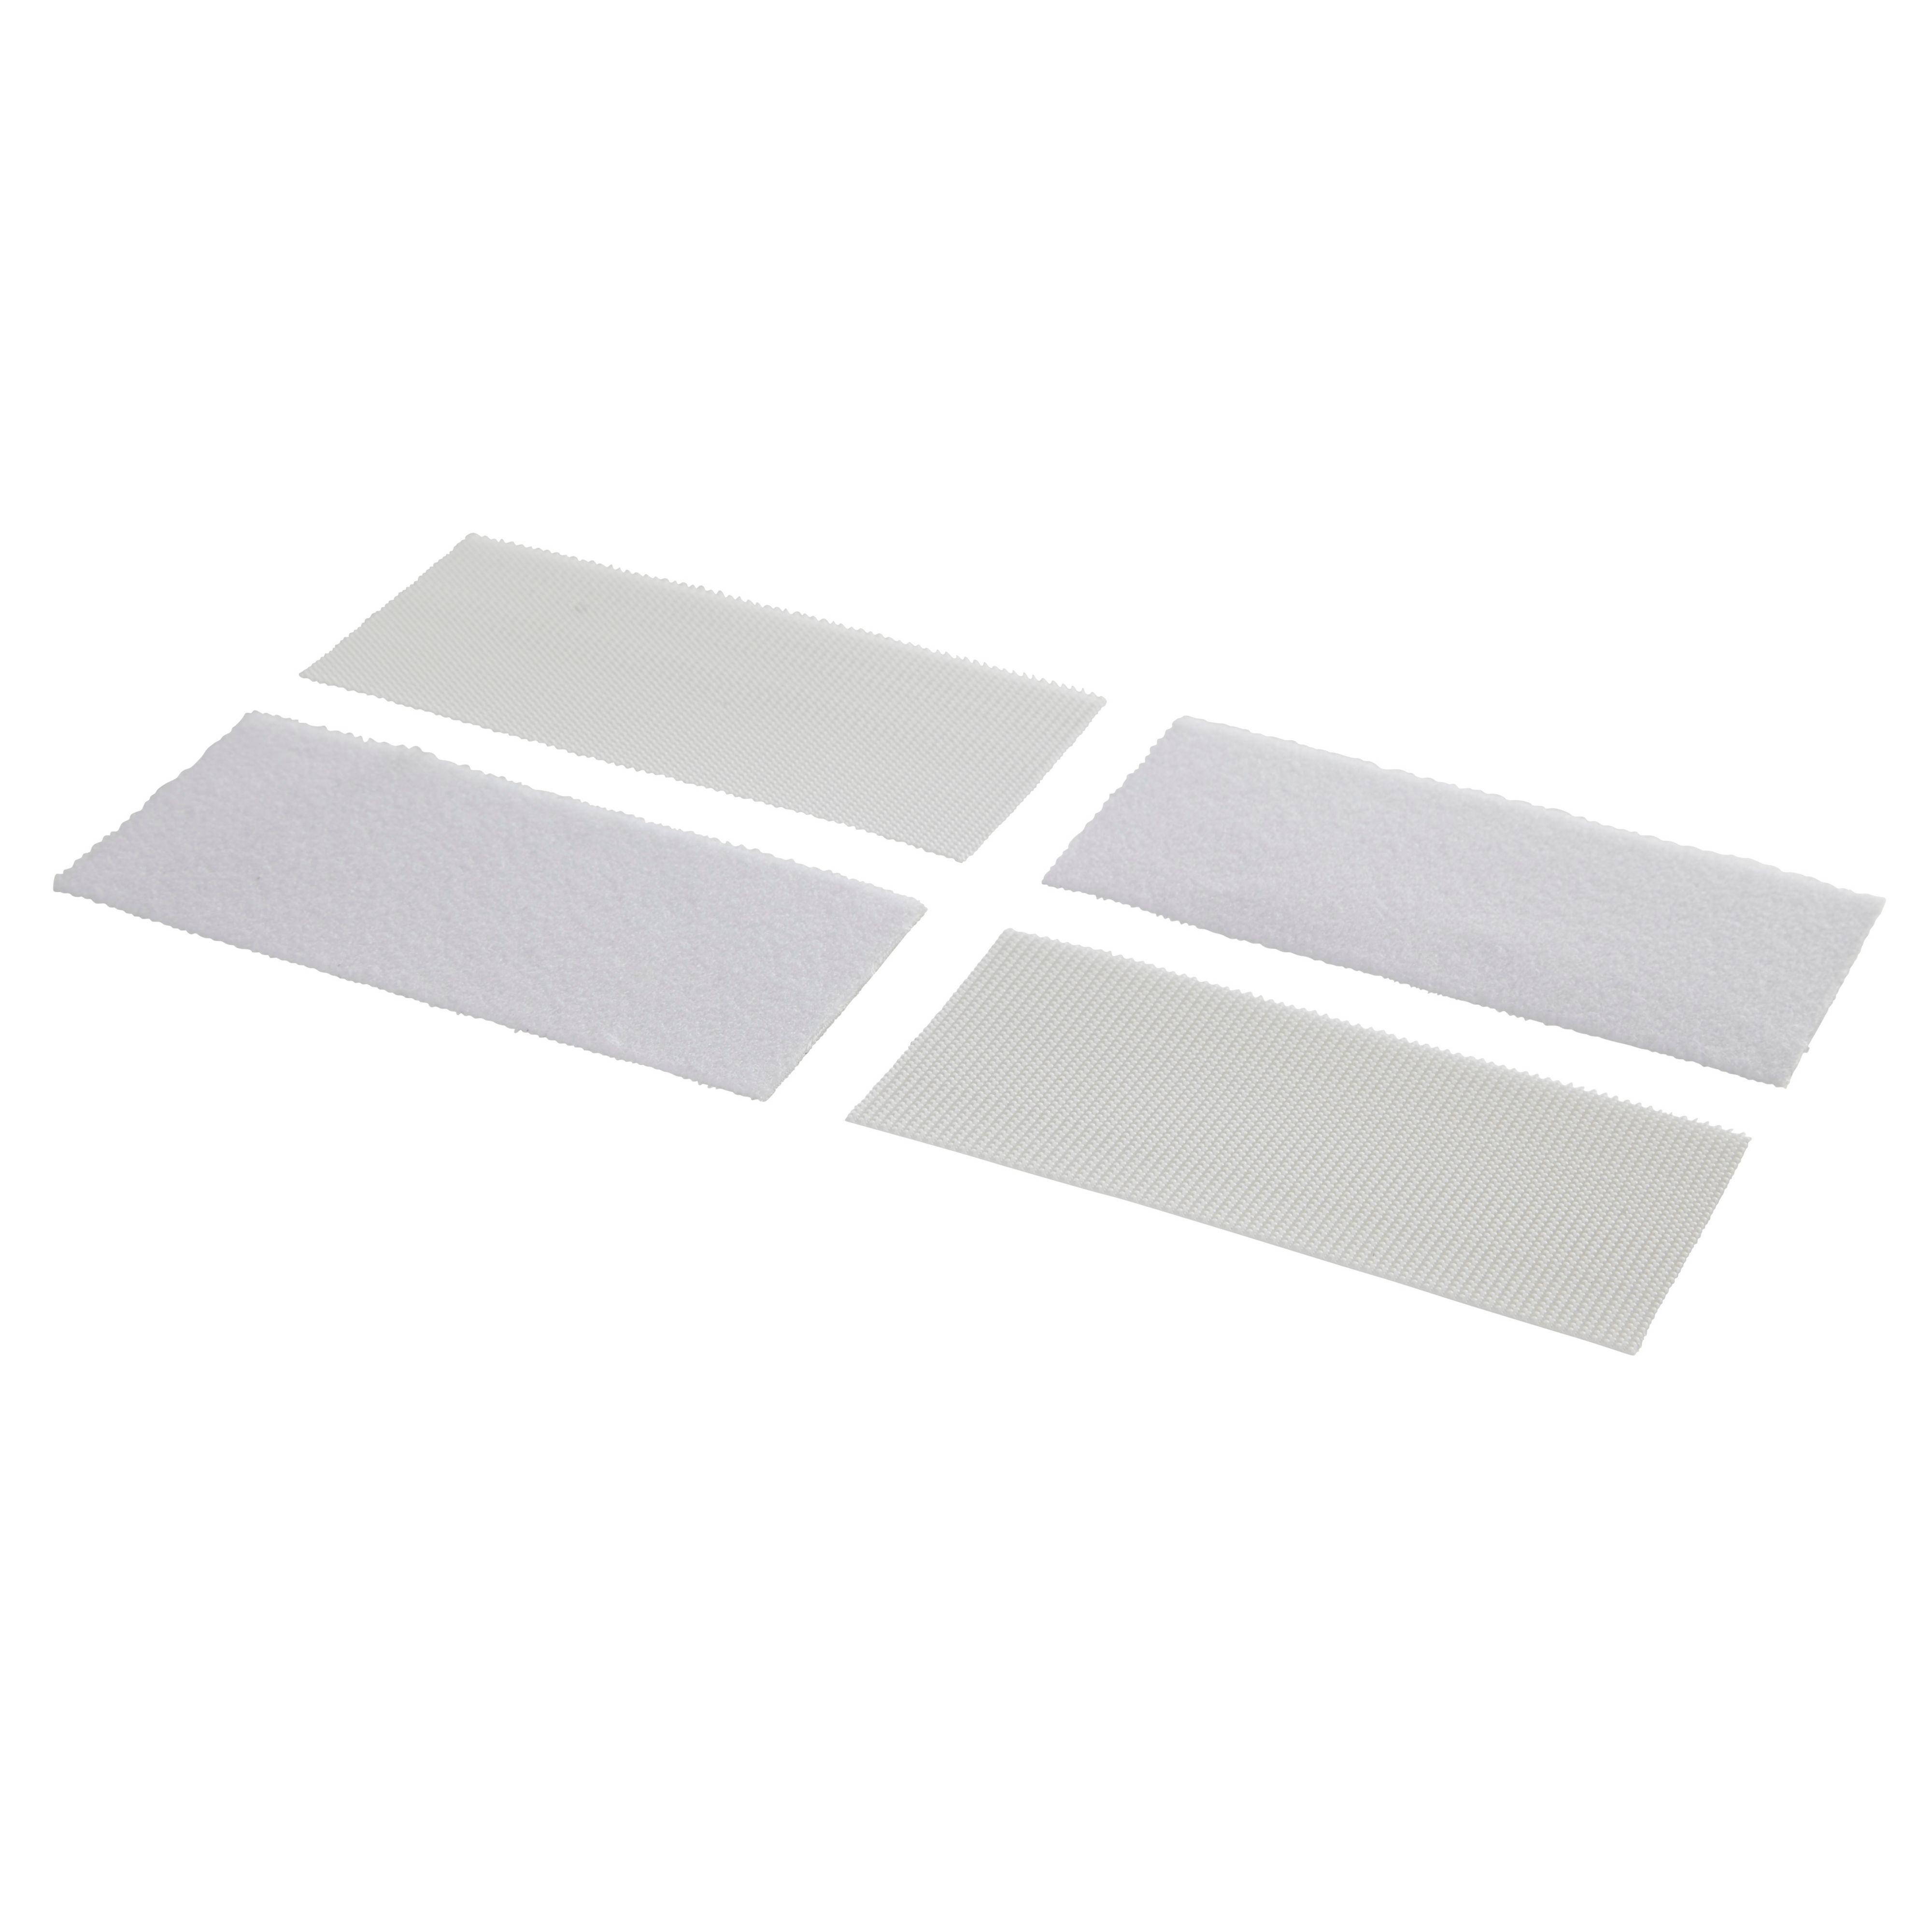 Griptite White Stick On Strip L 100mm Pack Of 2